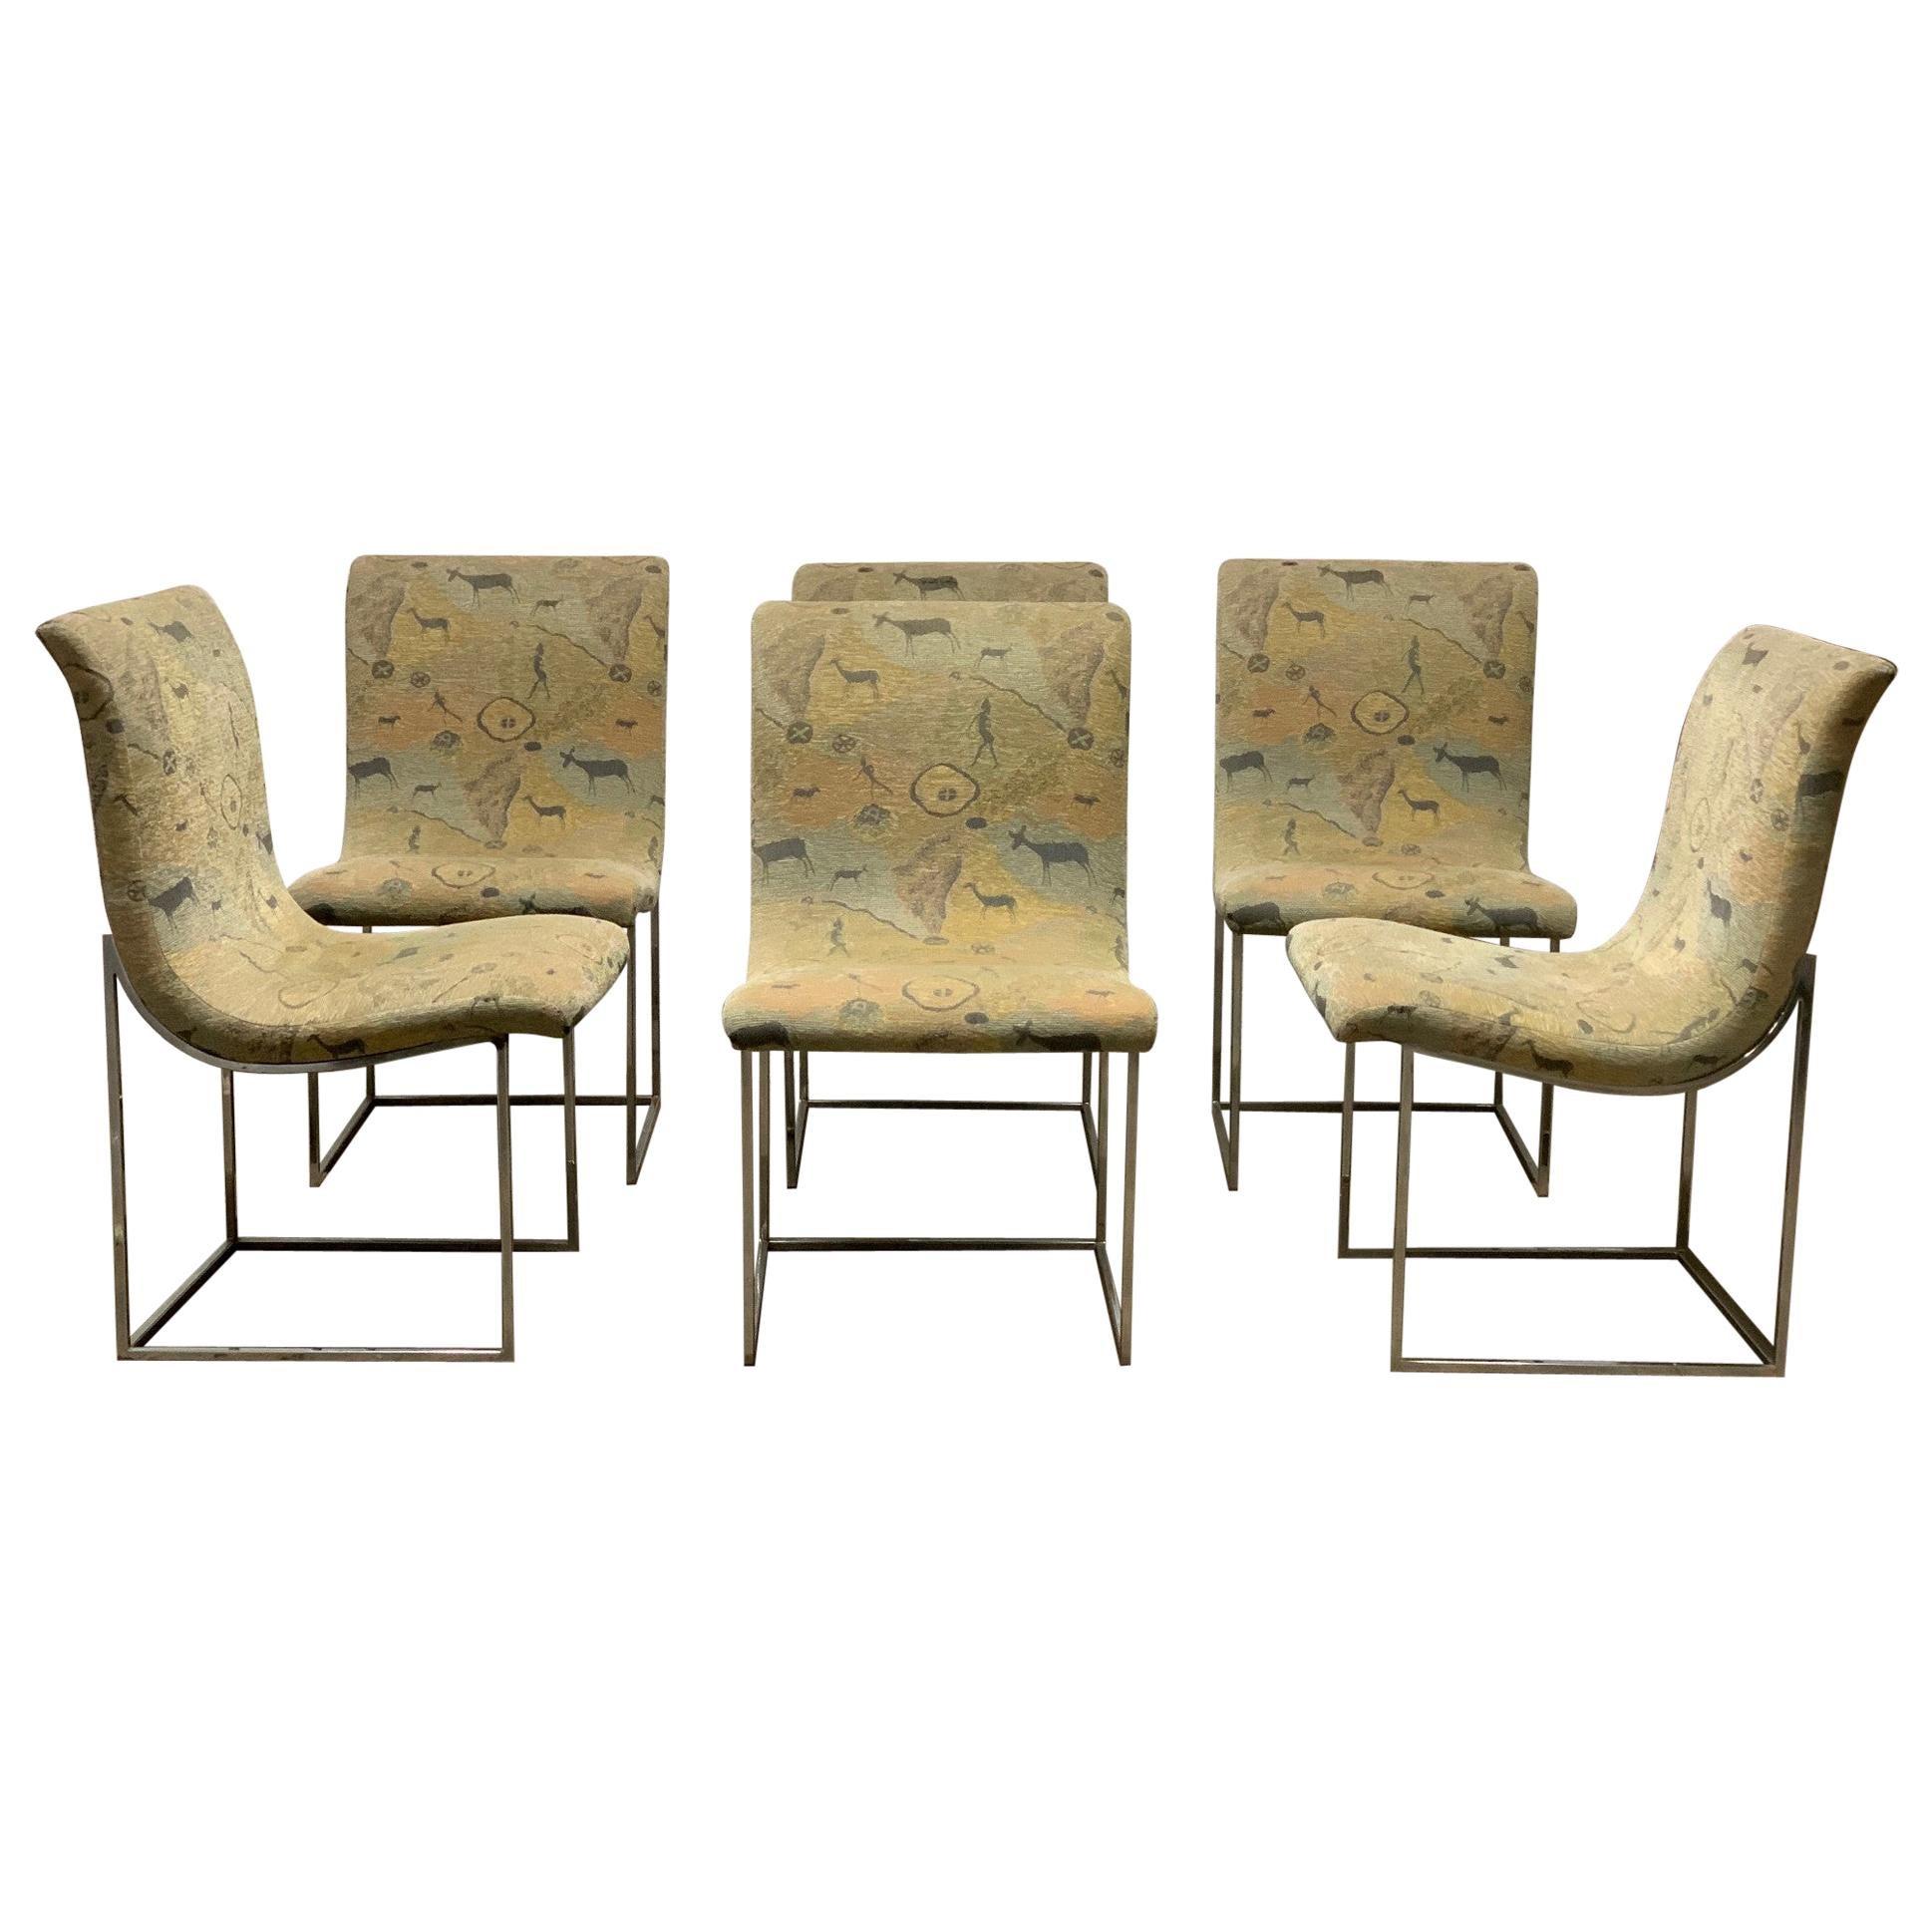 Set of Six Milo Baughman Scoop Chrome Dining Chairs